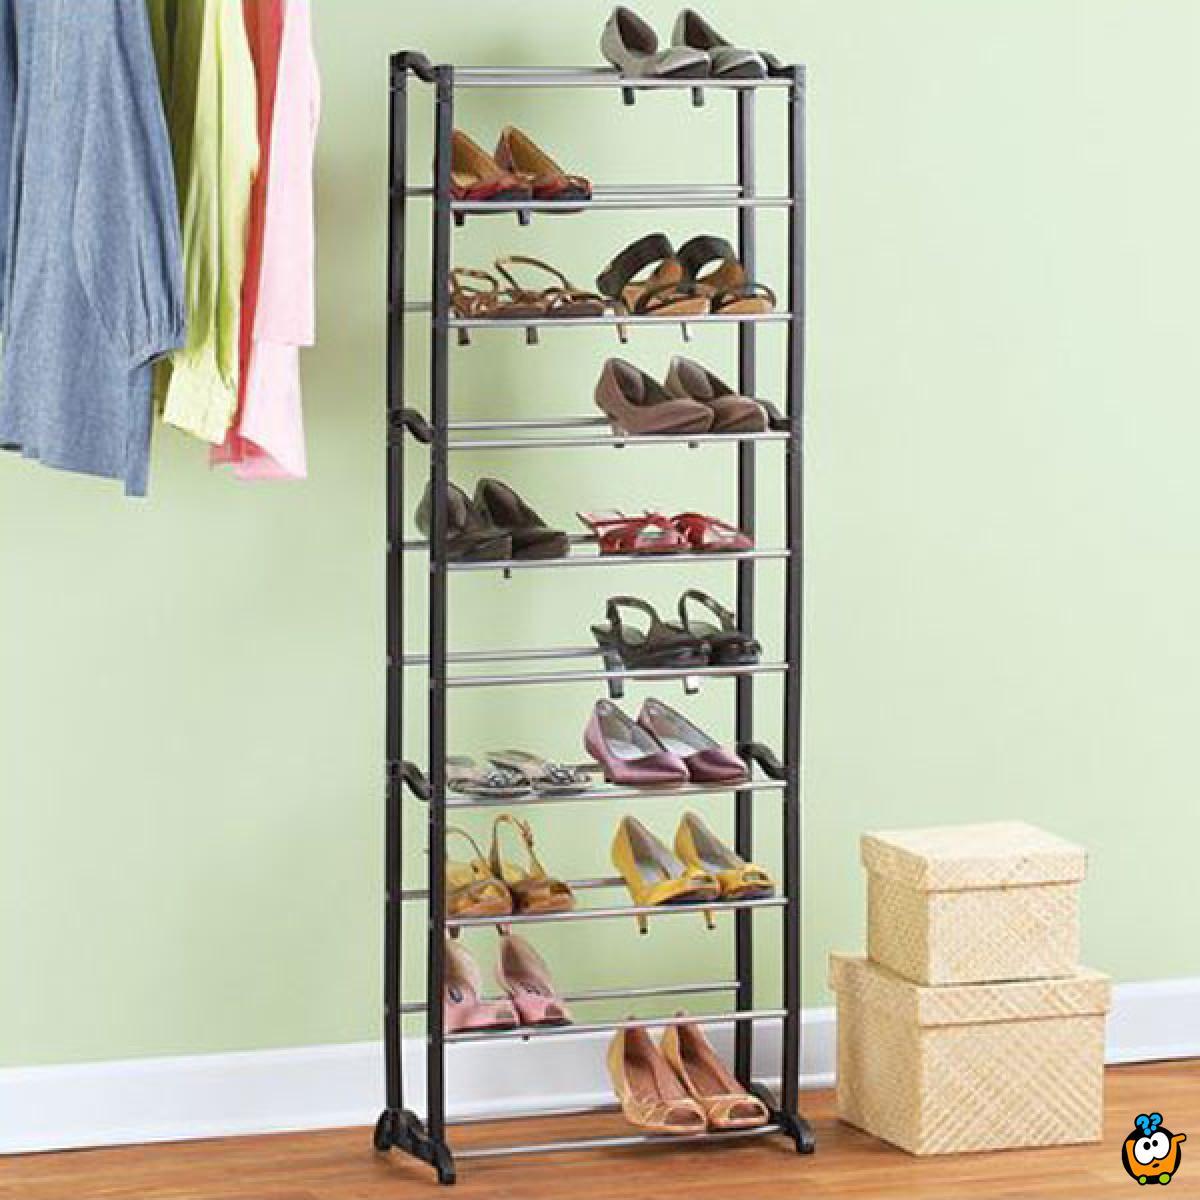 Jumbo shoe rack visoki cipelarnik na 10 nivoa